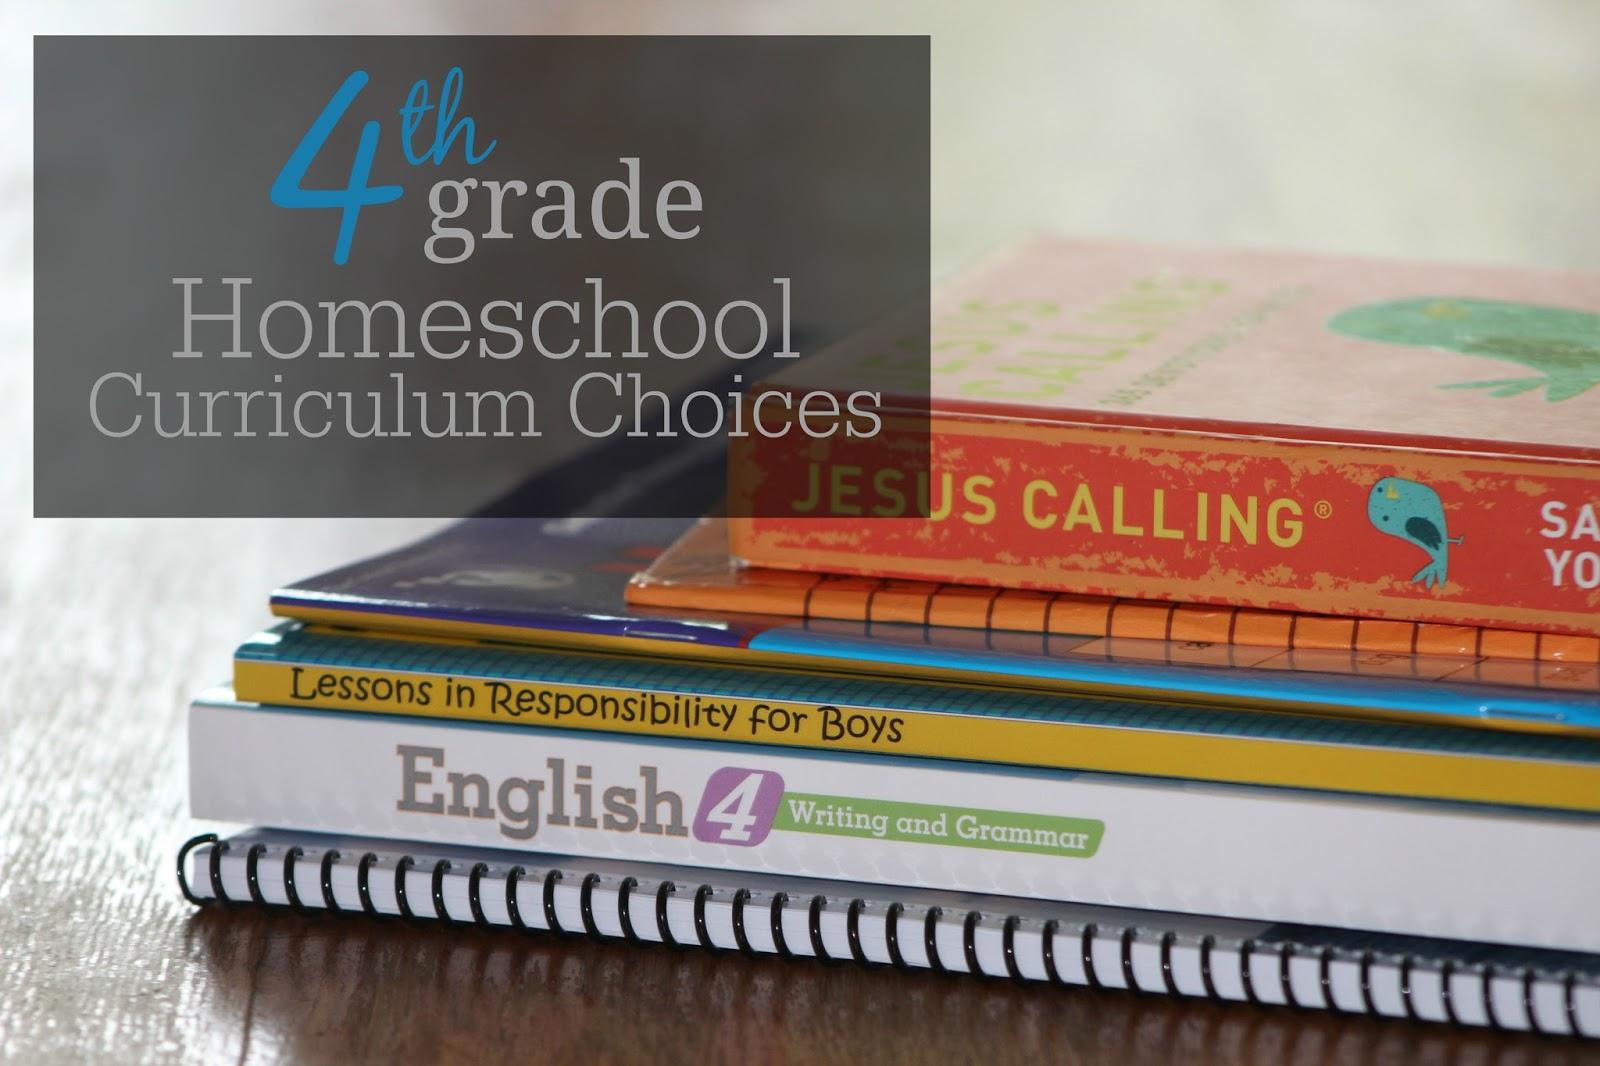 The Unlikely Homeschool 4th Grade Homeschool Curriculum Choices